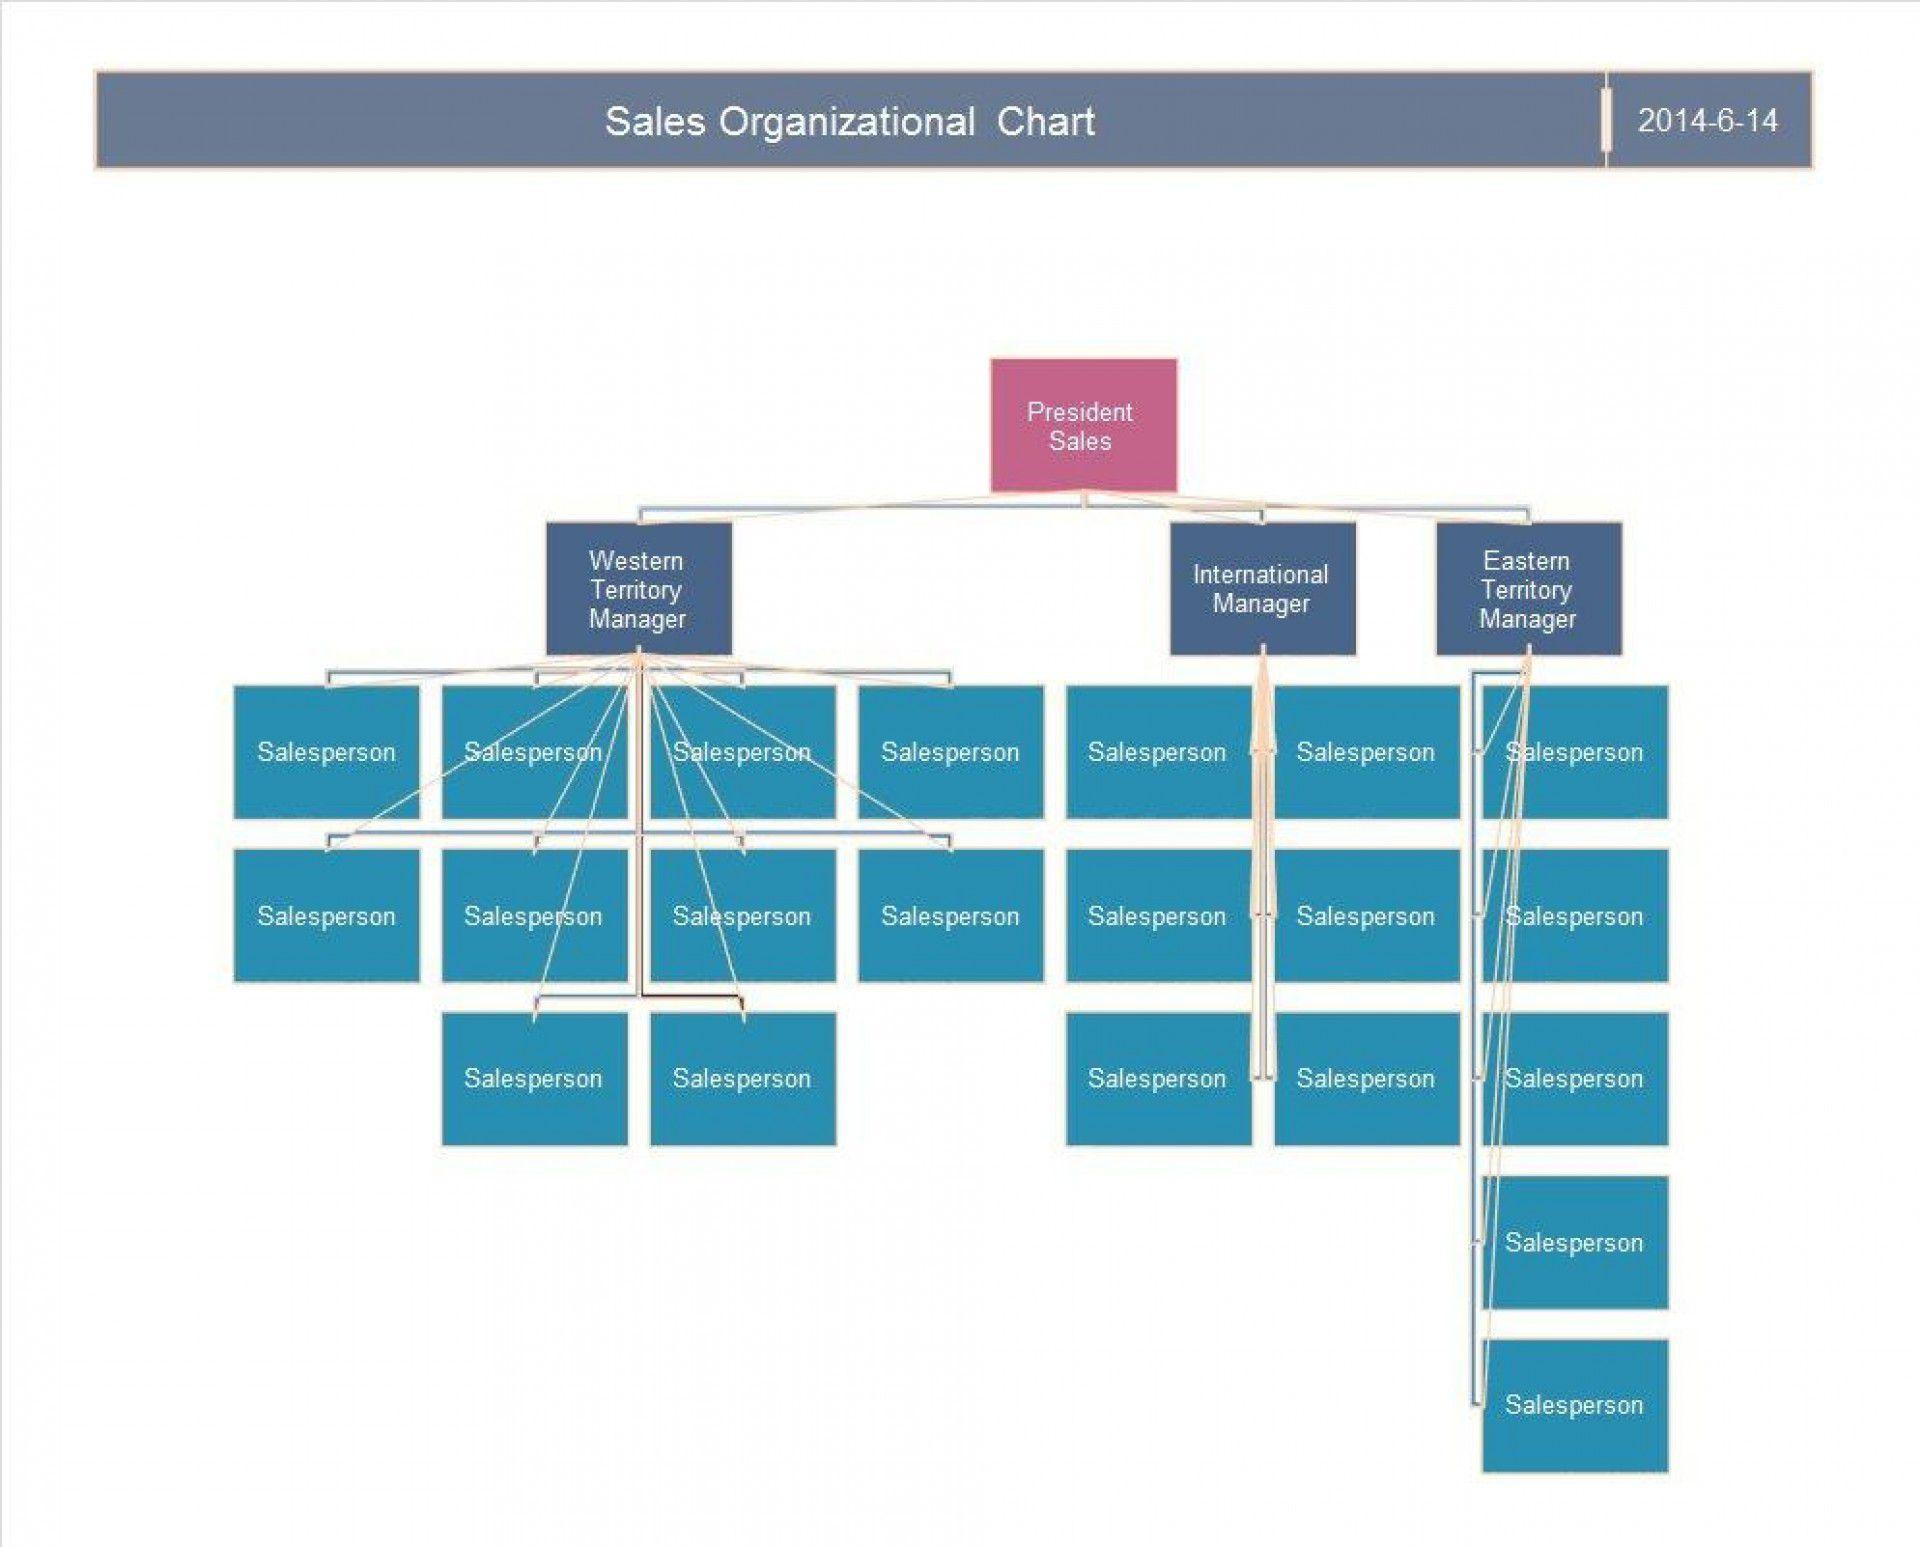 005 Amazing M Office Org Chart Template High Definition  Microsoft Free OrganizationalFull